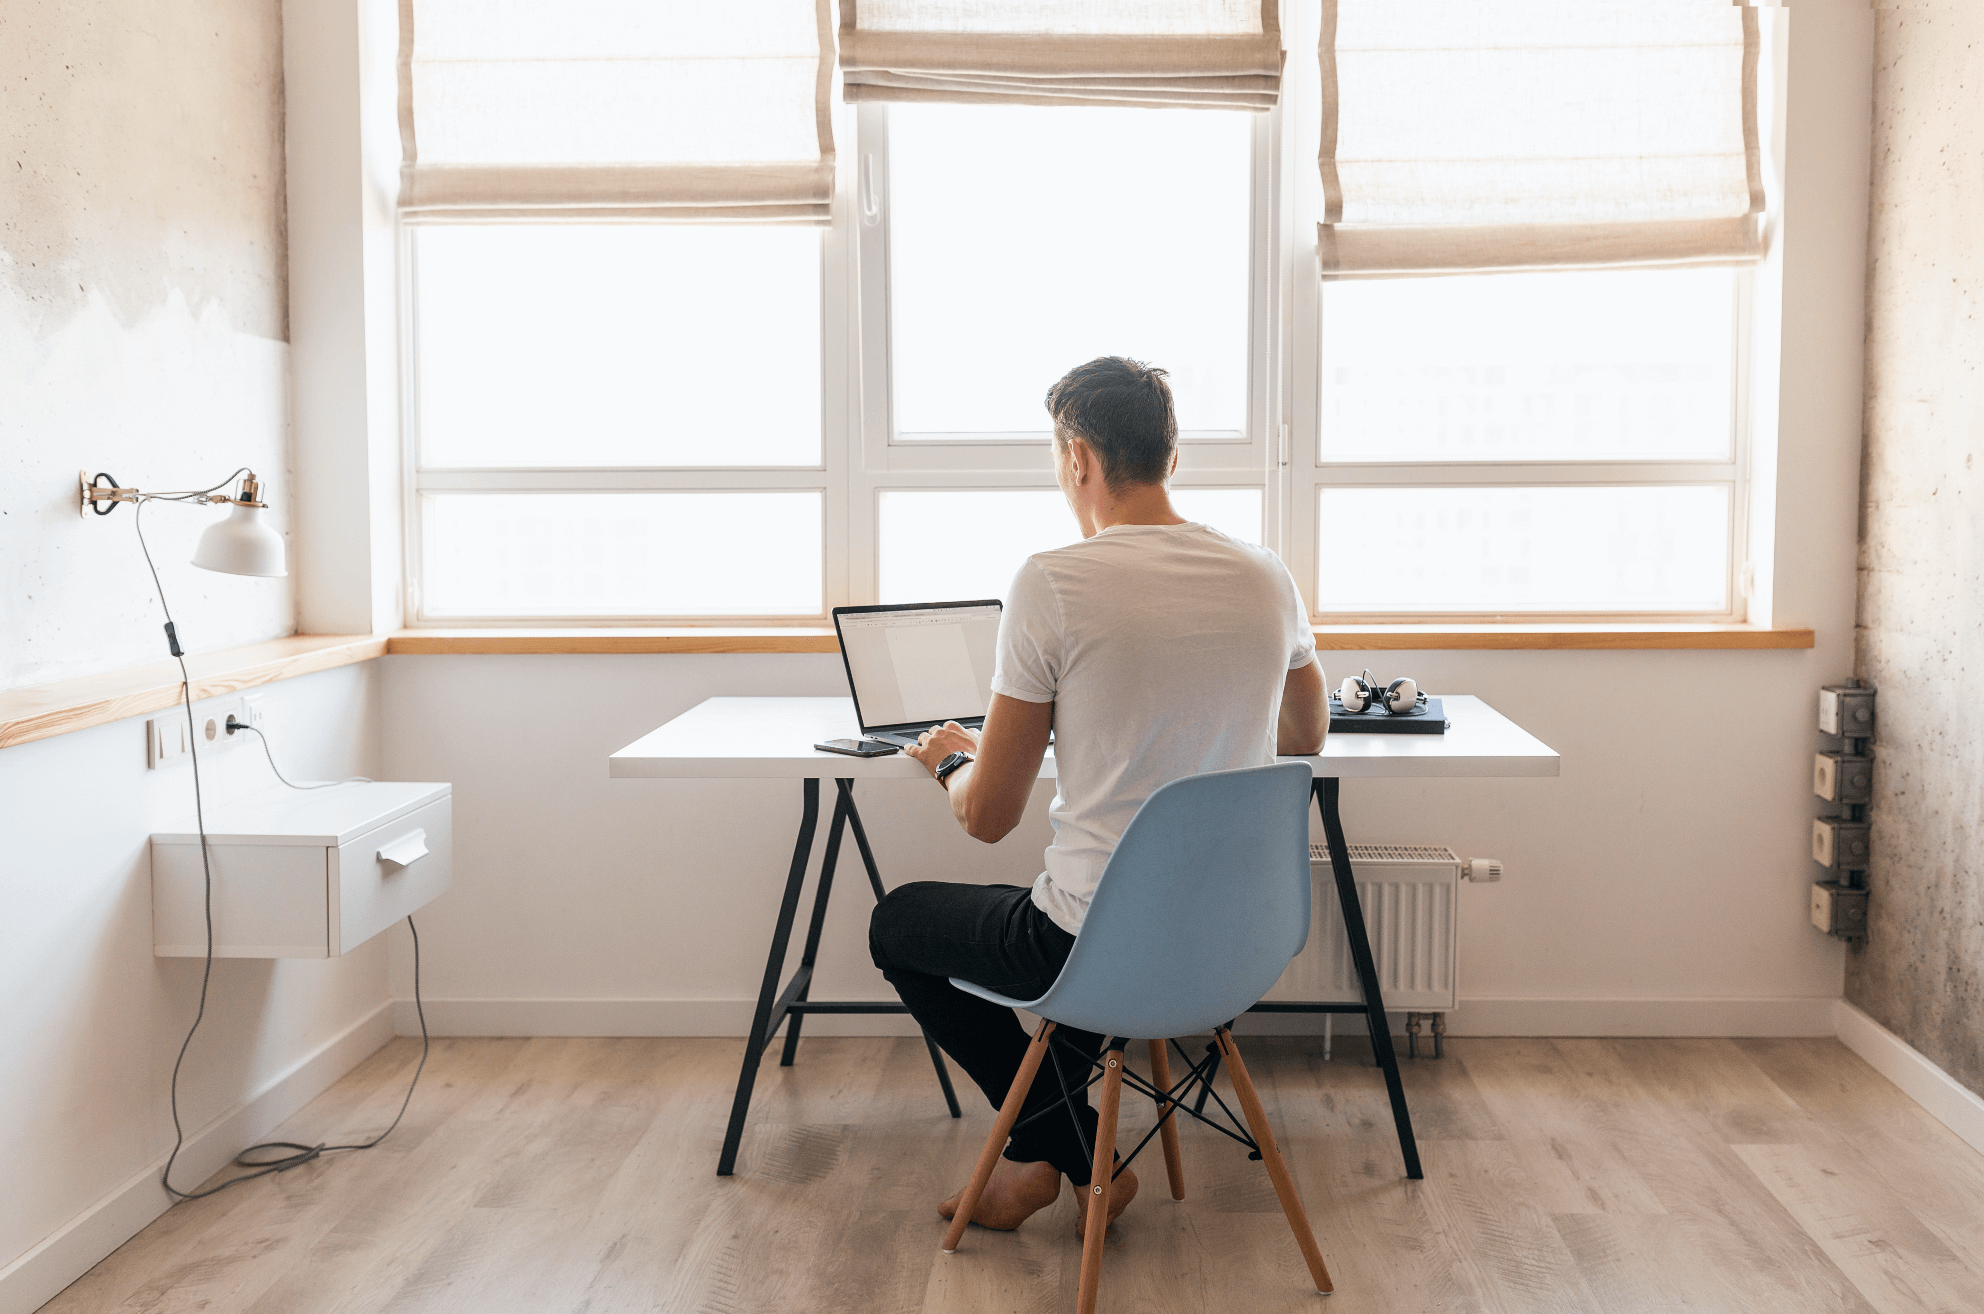 Rutinas sanas para mejorar tu productividad teletrabajando.